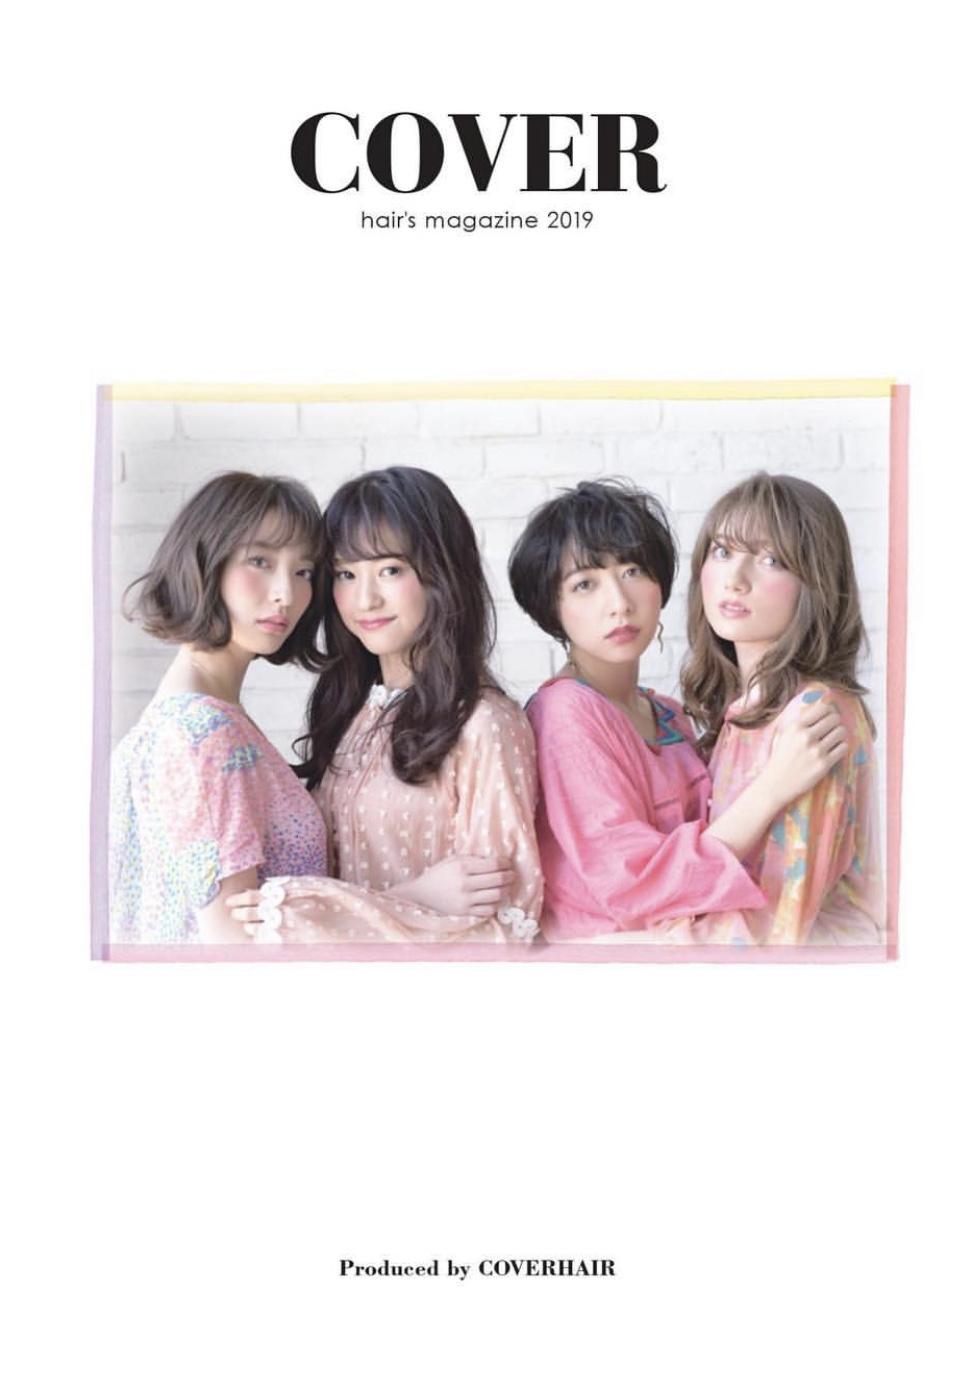 COVER hair's magazine 2019